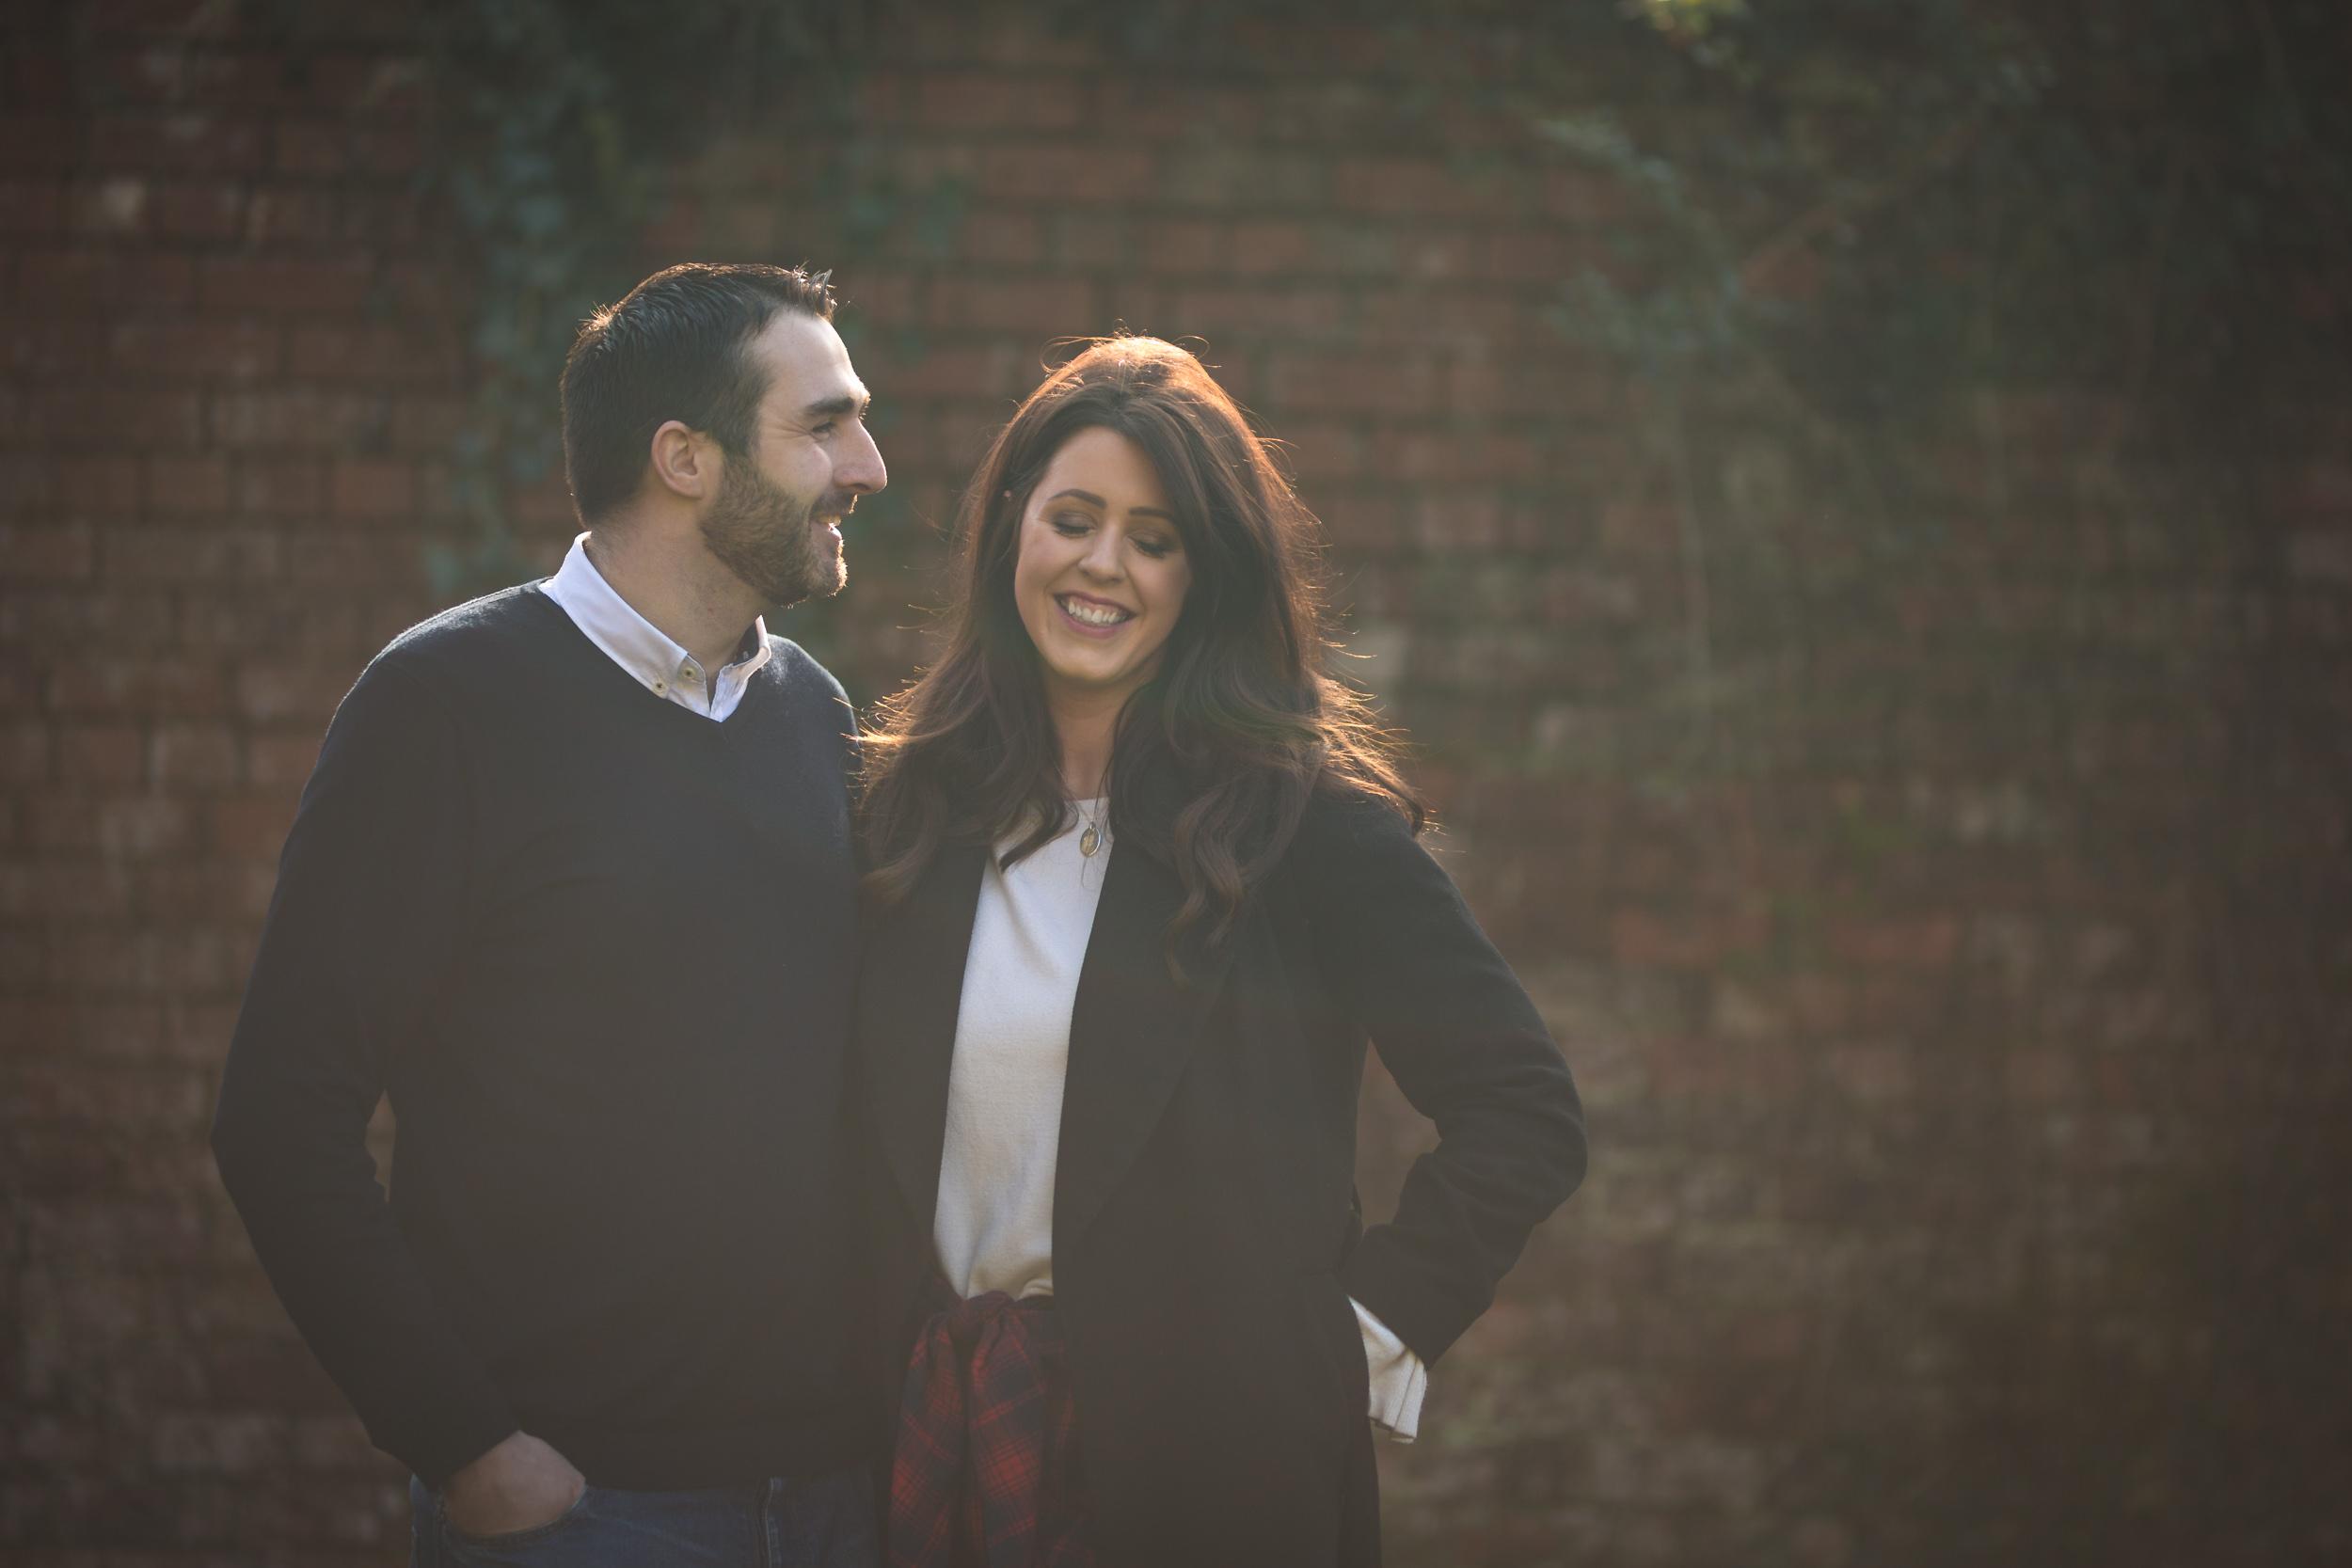 Oonagh & Francis Engagement-5.jpg